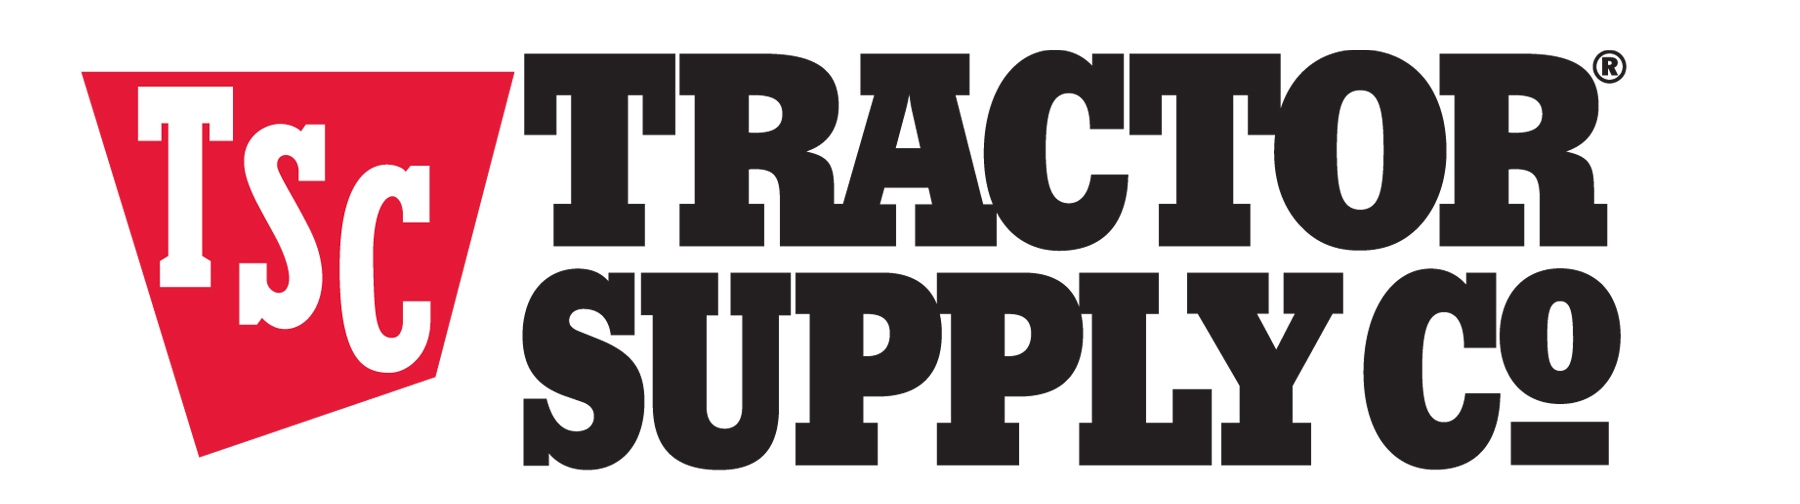 Tractor supply co de form 10 k february 18 2015 tractor supply company buycottarizona Gallery